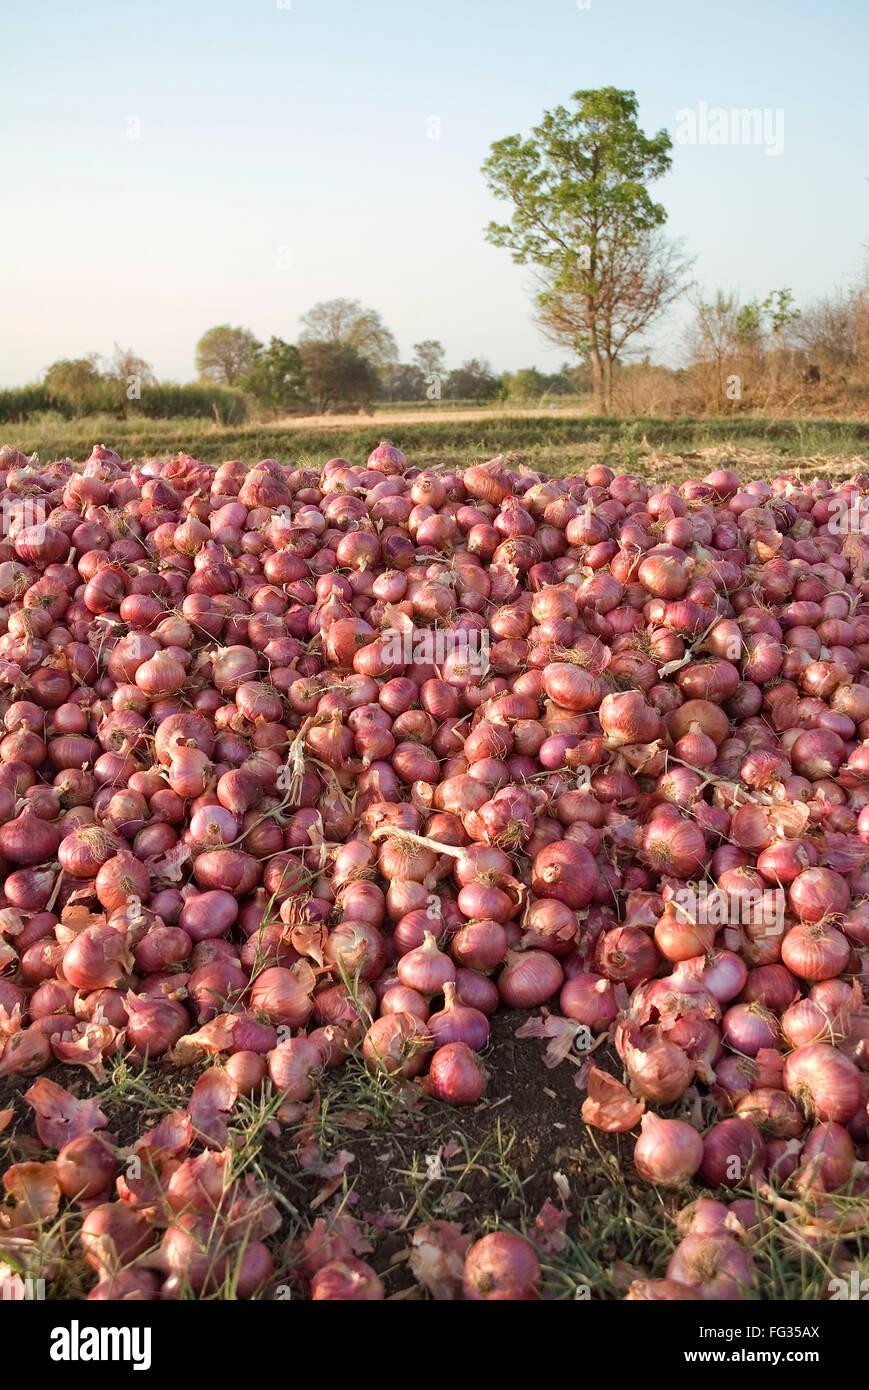 Pile of red skinned onions allium cepa - Stock Image